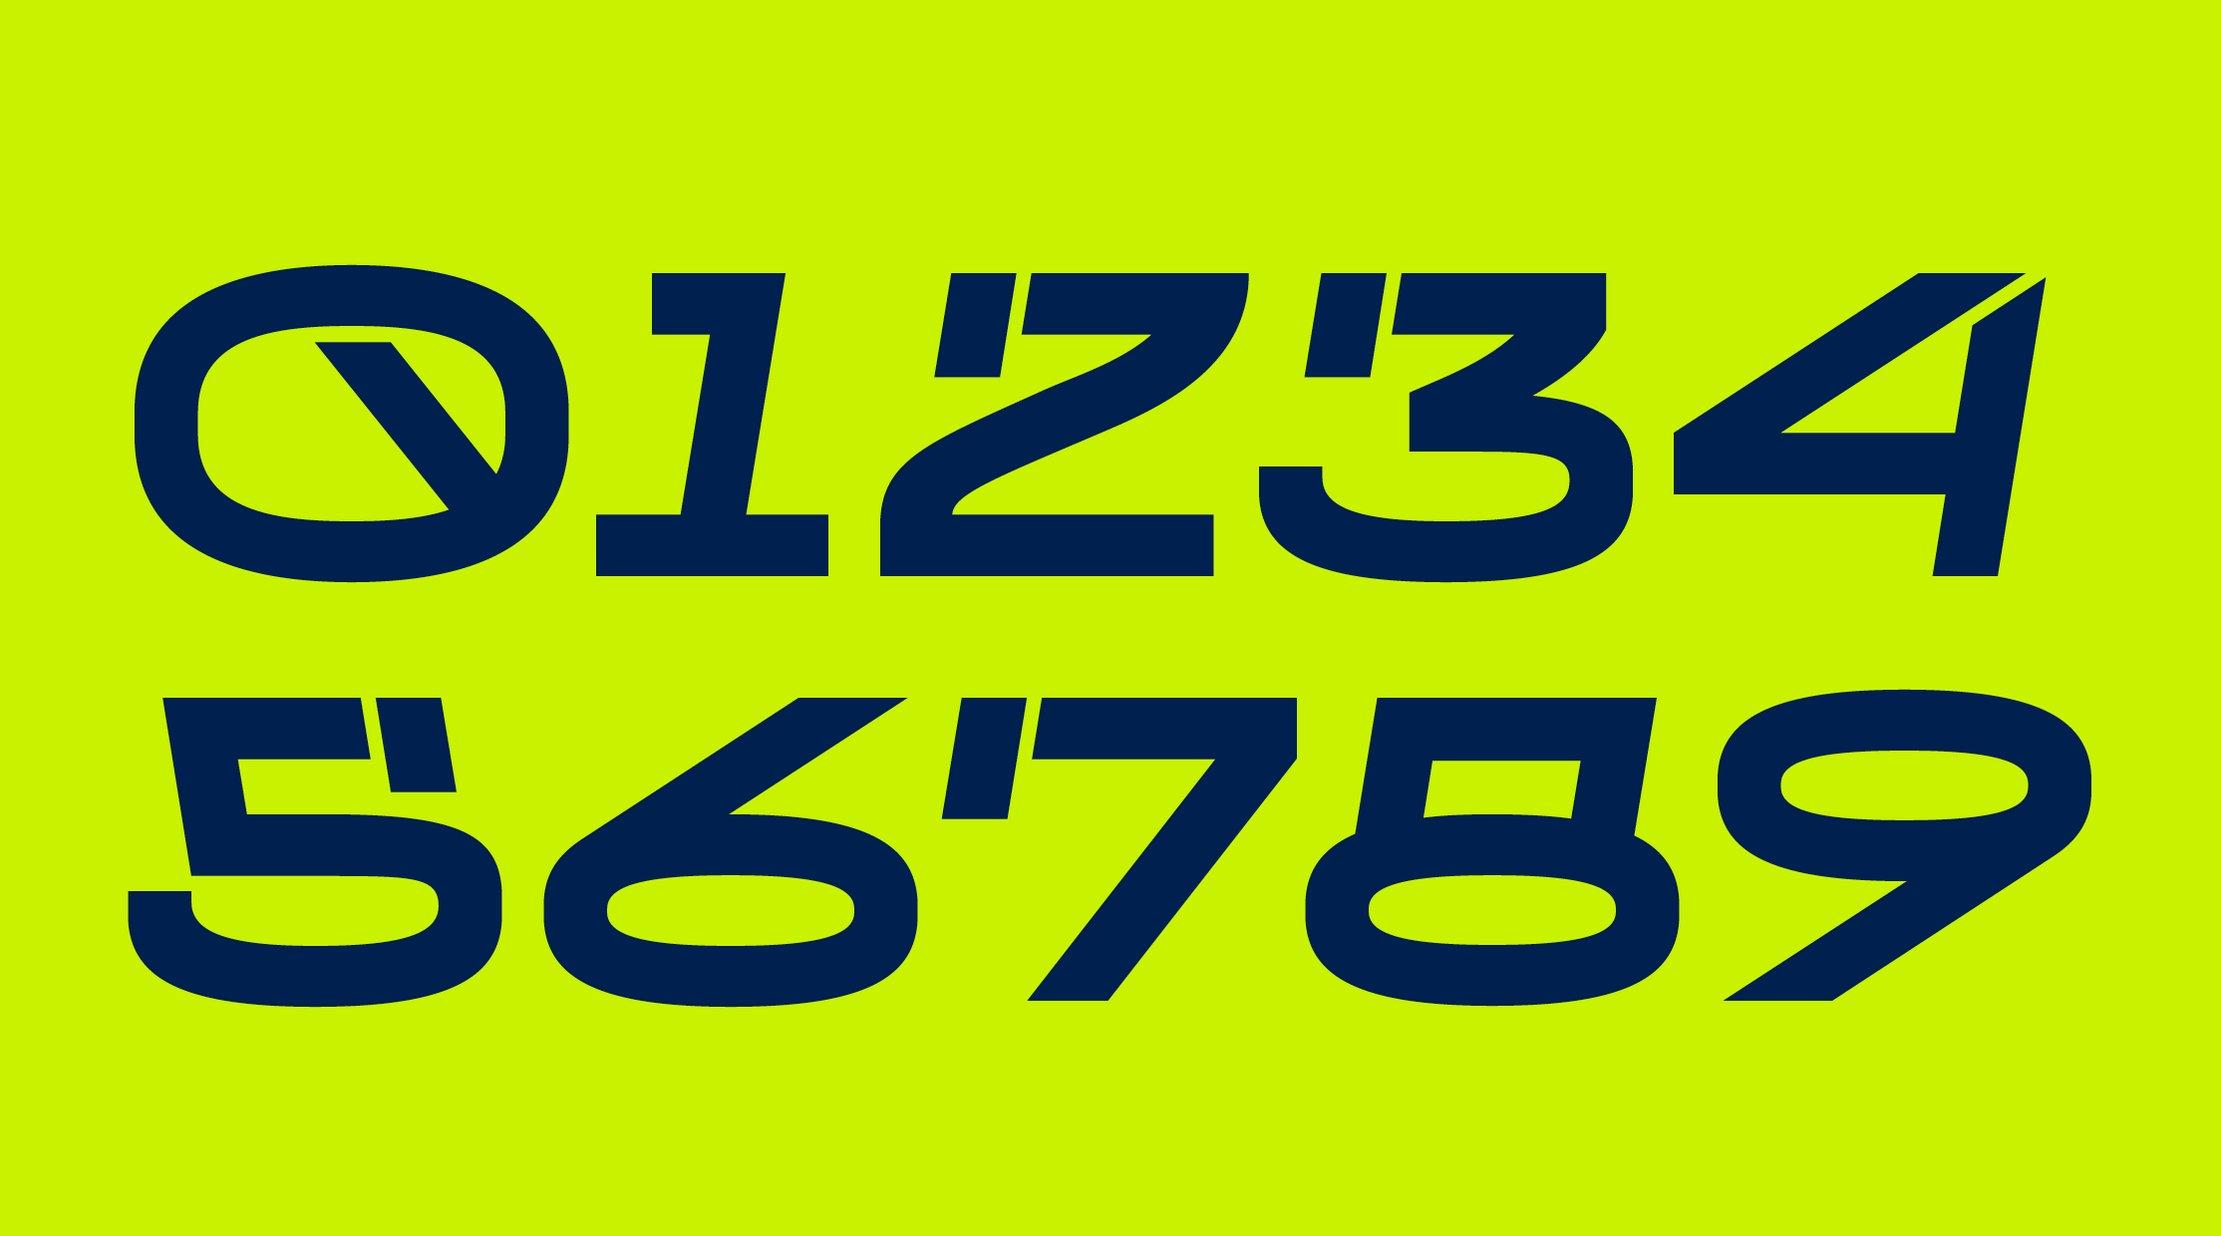 KRSNA + BRRR - Swiss Typefaces